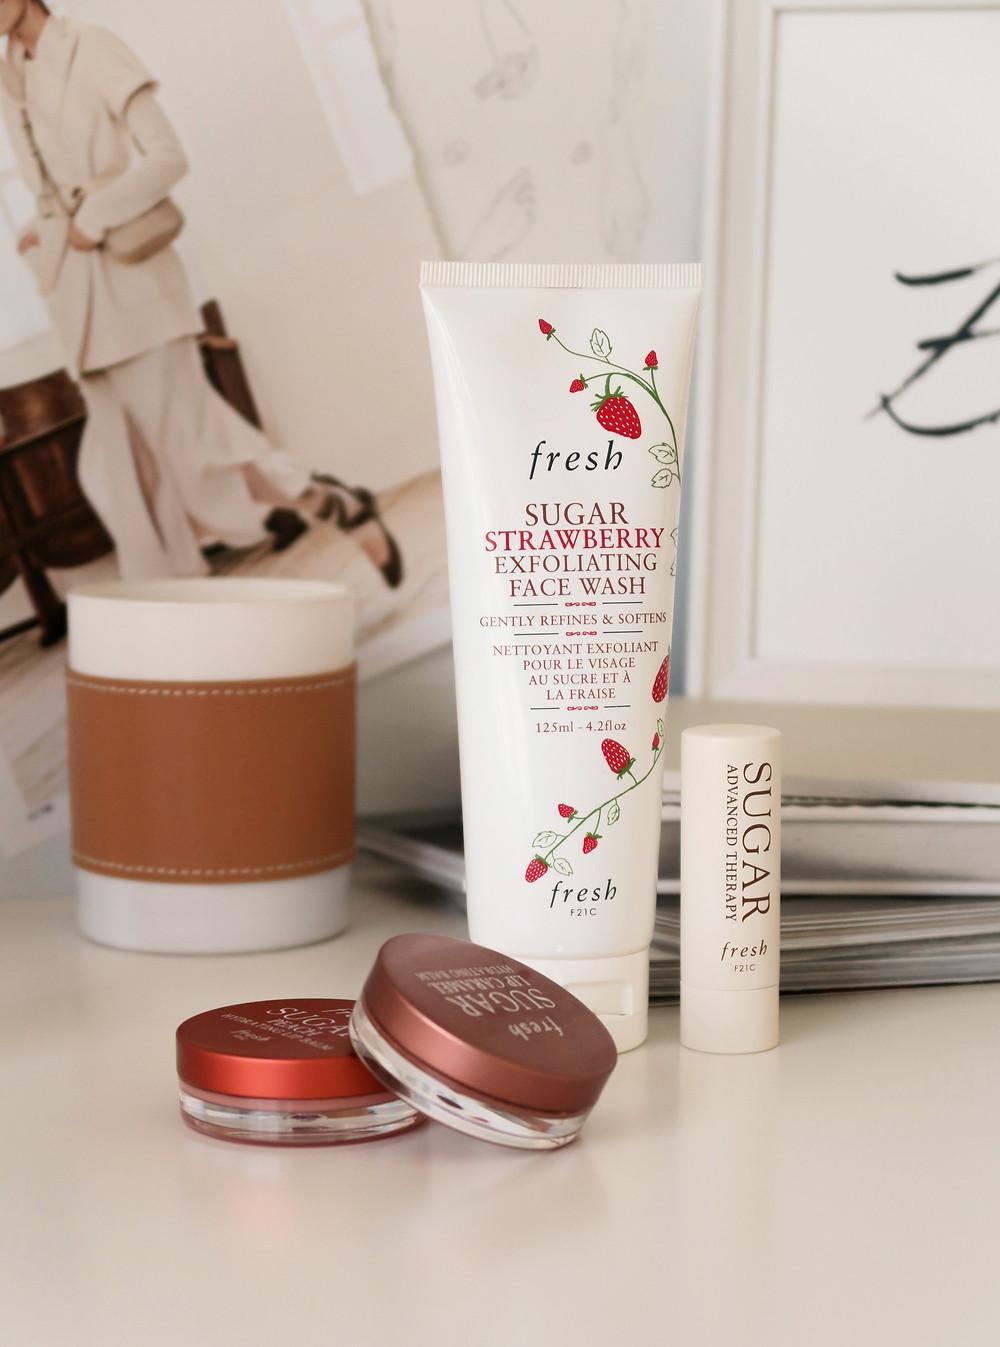 fresh sugar strawberry exfoliating face wash review